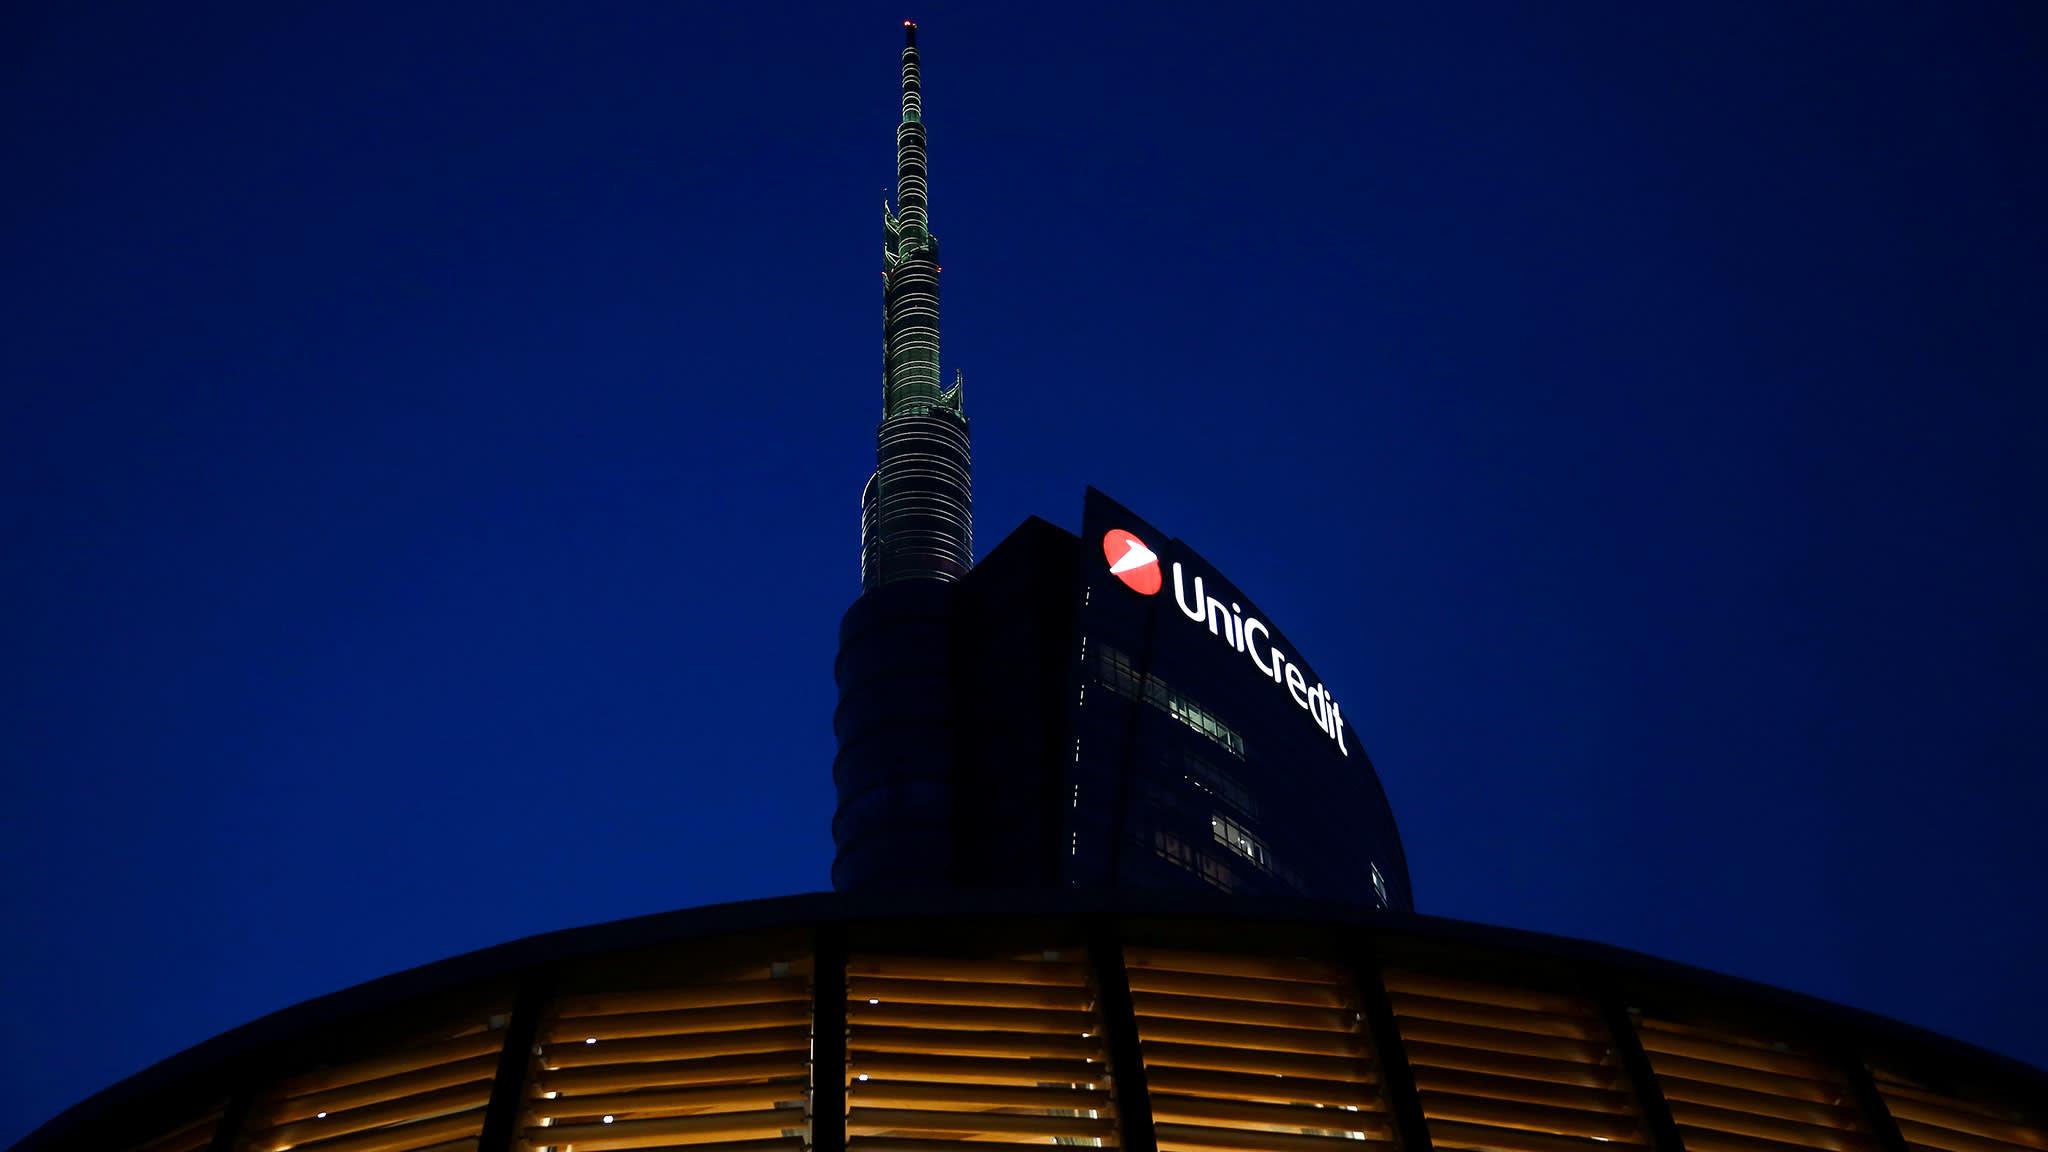 Europe's banking union lacks the key element of deposit insurance